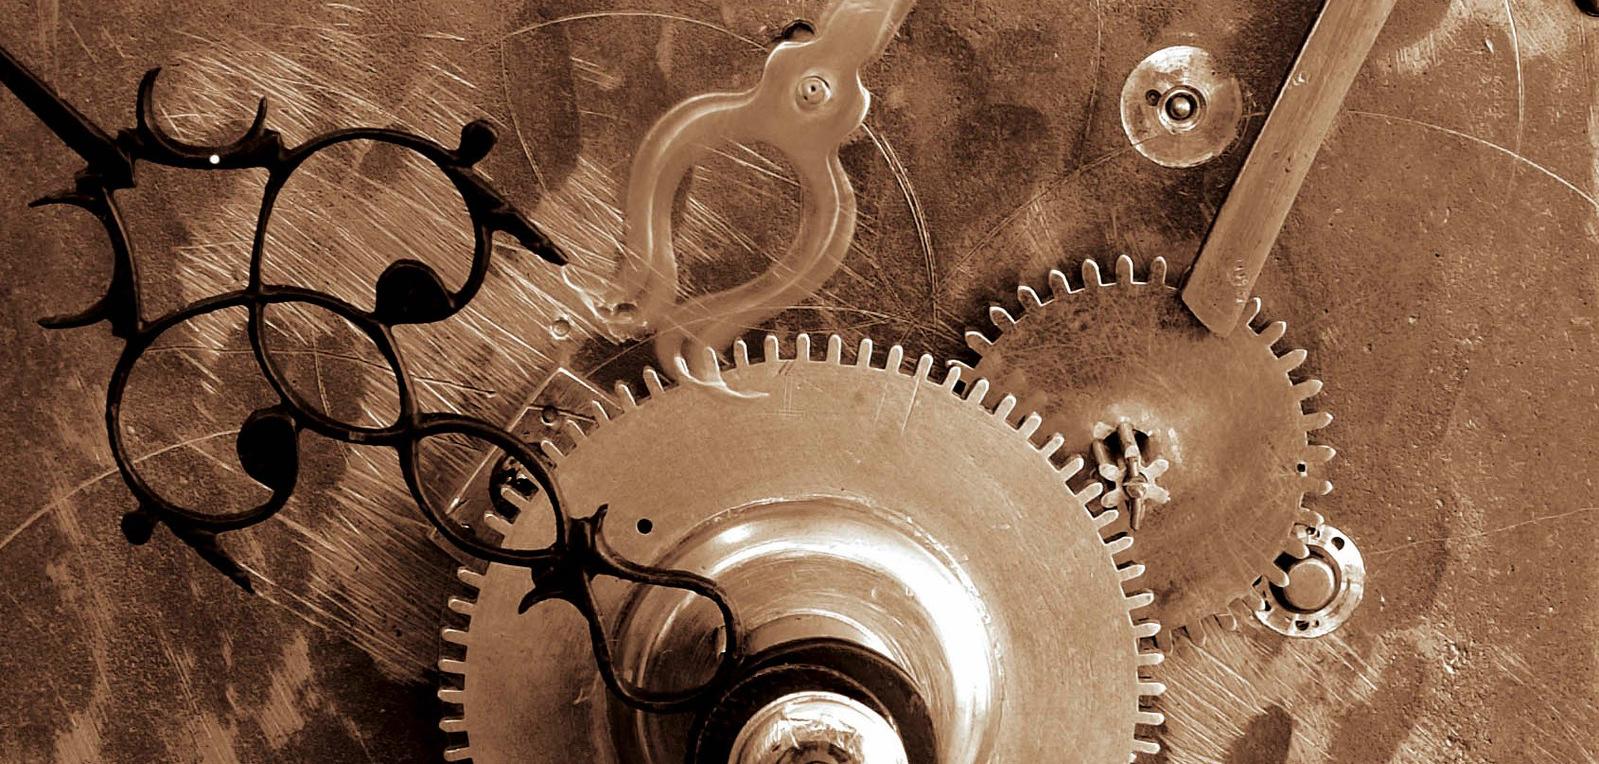 just-like-clockwork-1192669-1599x1254 Dominic Morel freeimages